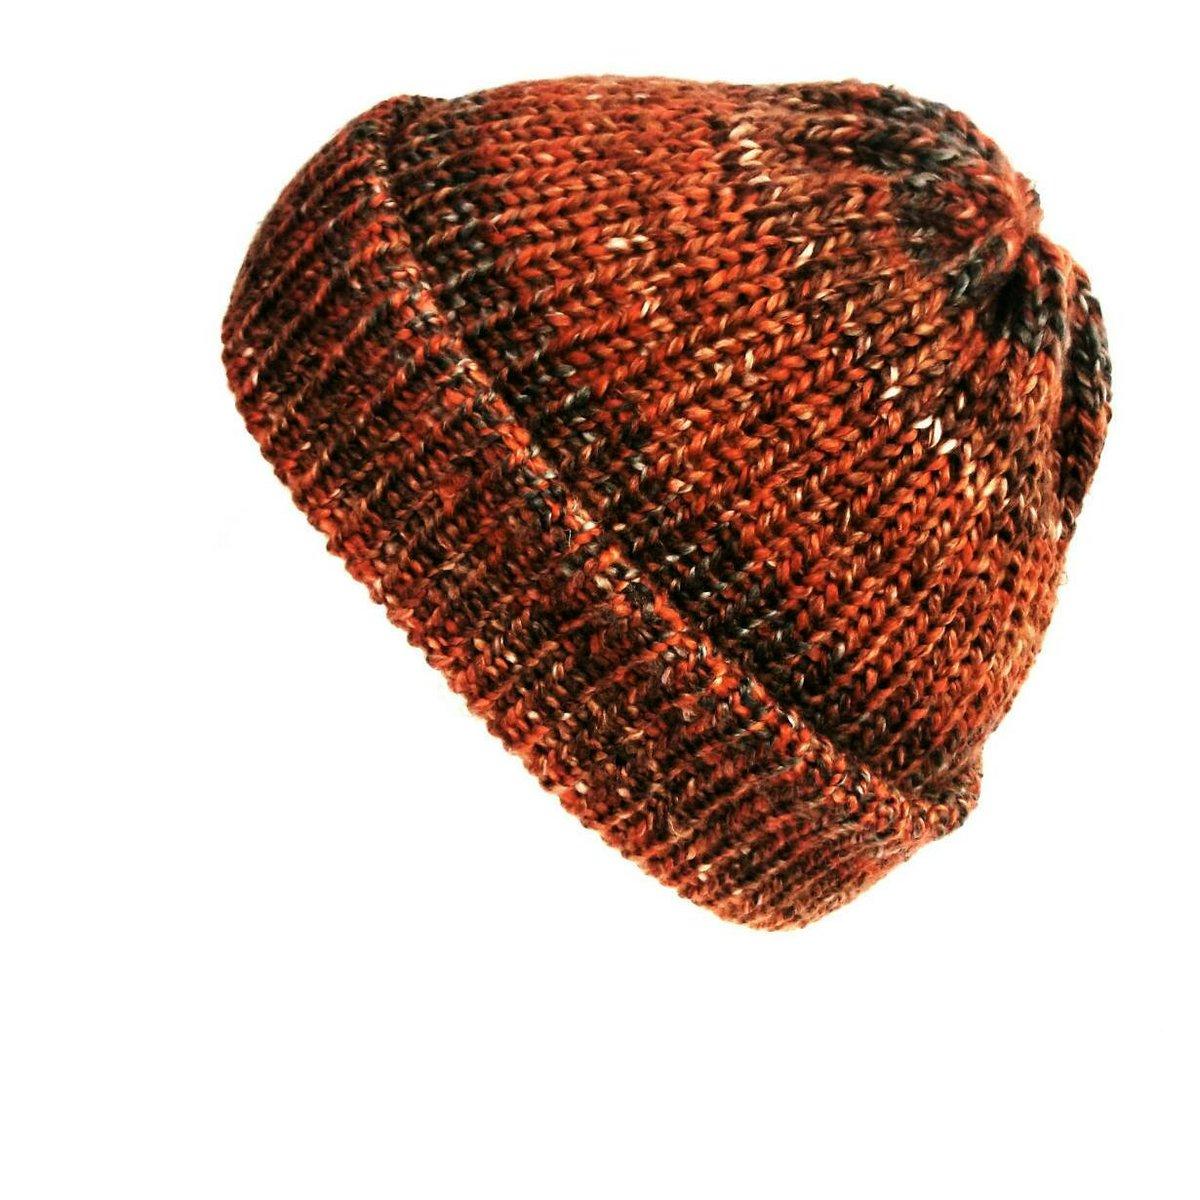 Burnt orange beanie, trawler beanie, cuffed beanie hat, soft vegan wool hat, knit skull beanie, winter hat for women, one size fits all https://etsy.me/2JDcl8d #Shopping #Knittedhats #Veganfashion #KnitSkullBeaniepic.twitter.com/Vgj1xkyf81